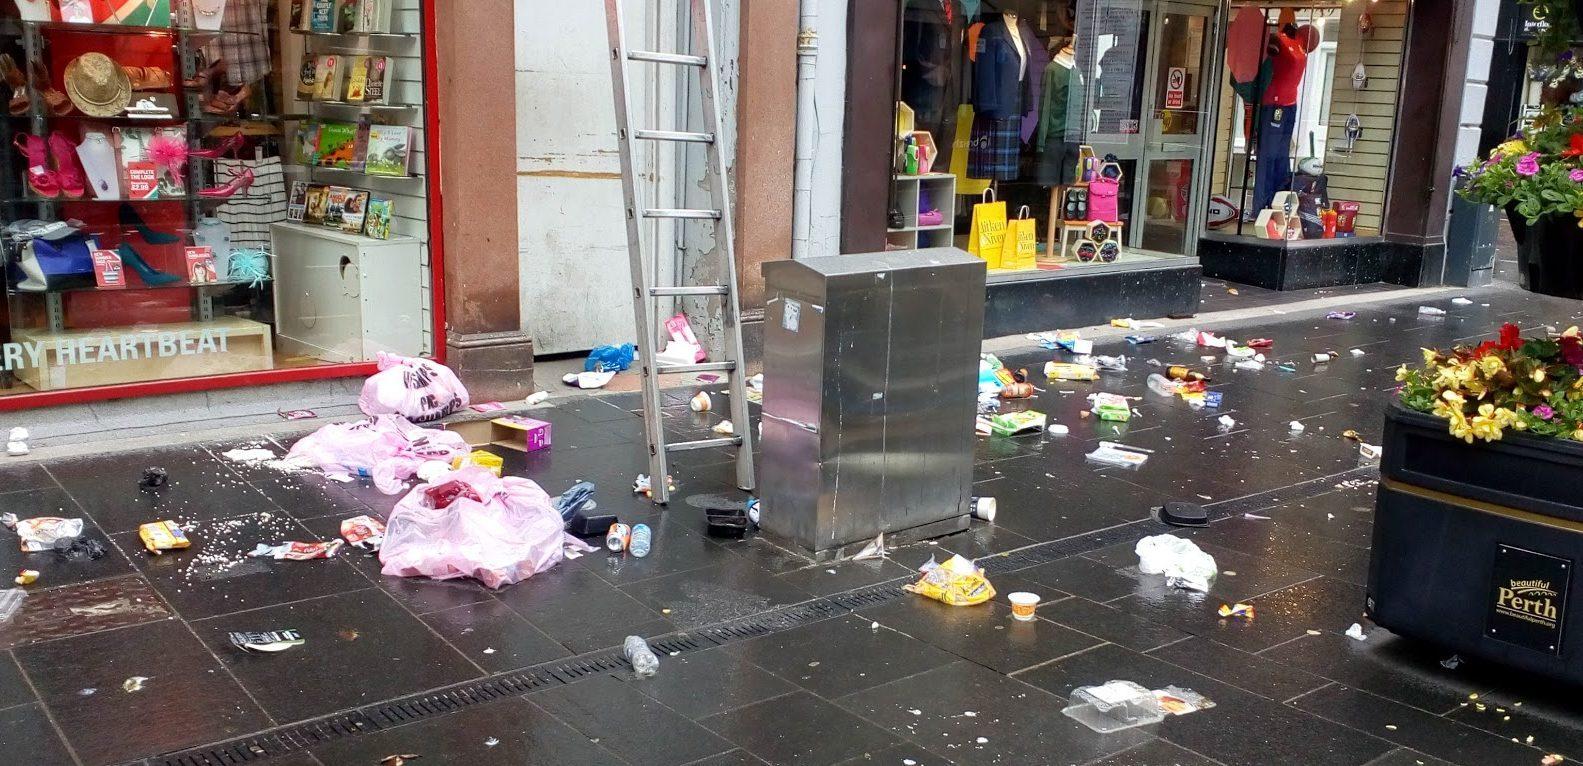 Rubbish strewn across Perth's High Street.